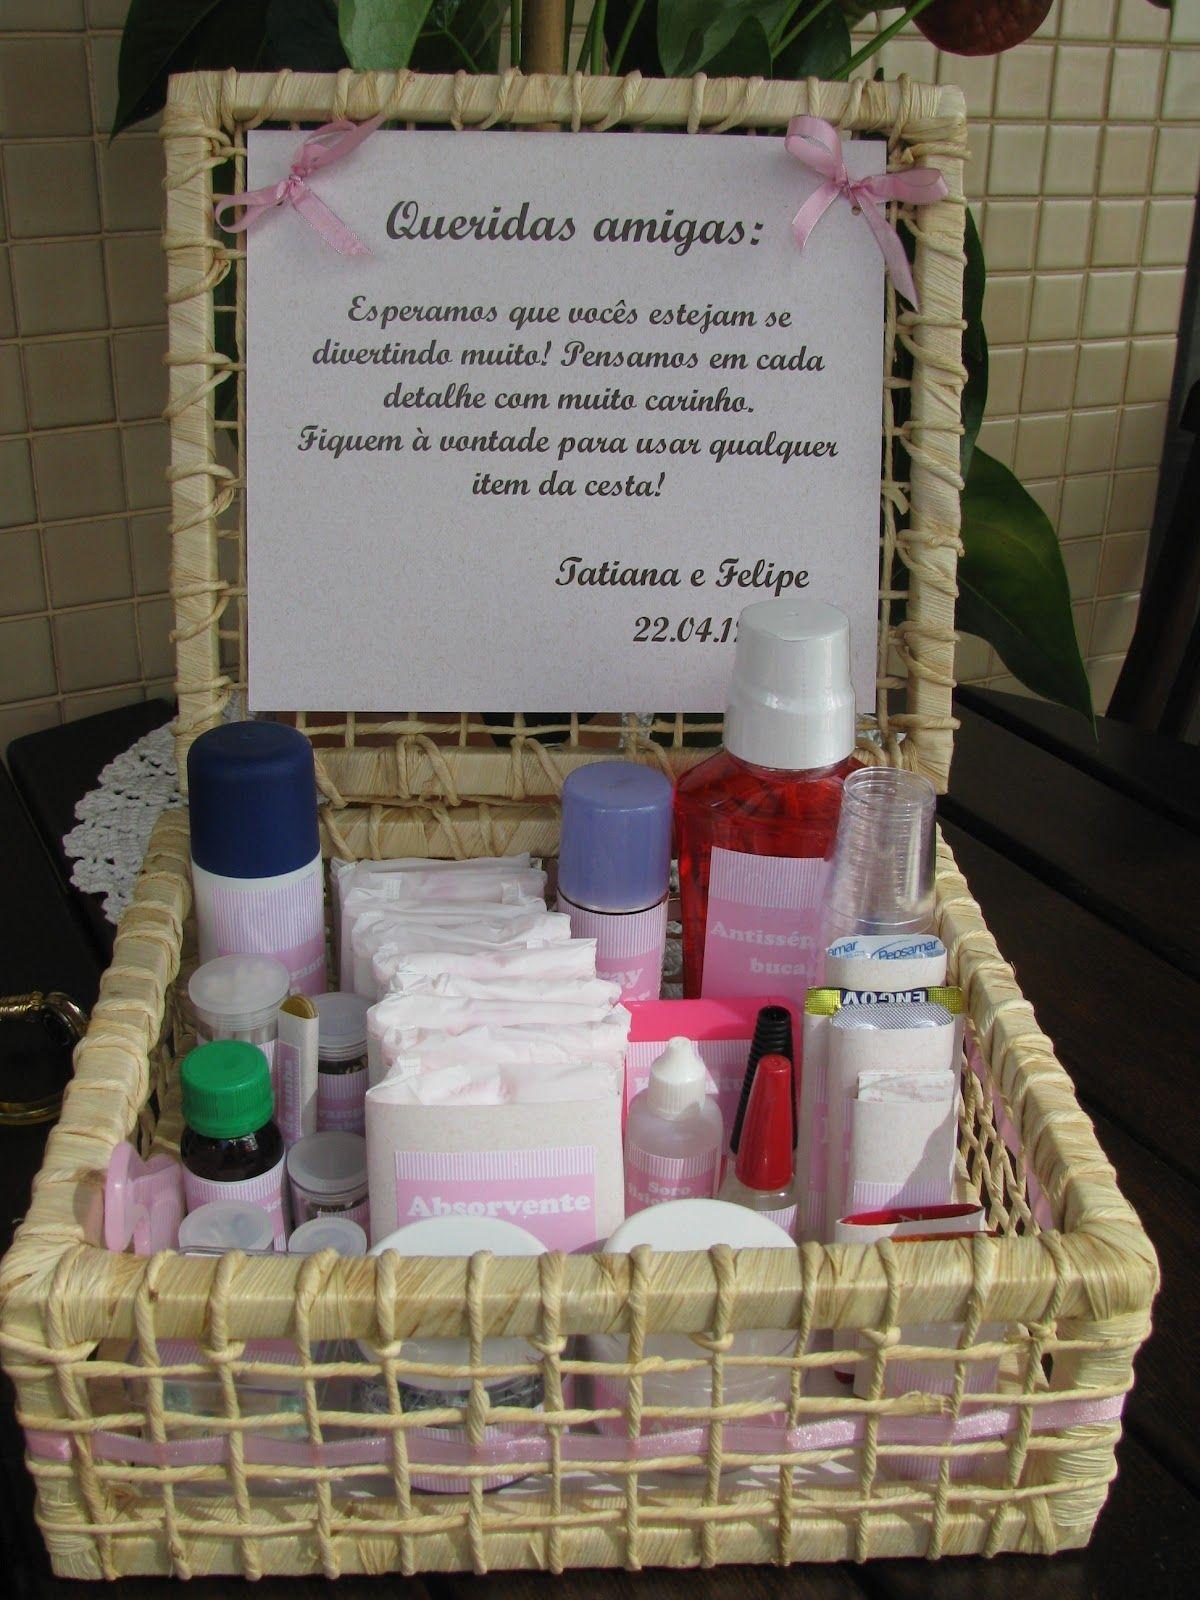 Kit Banheiro Casamento Rustico : Kit toalete cesta inspira??o pra simples casamento